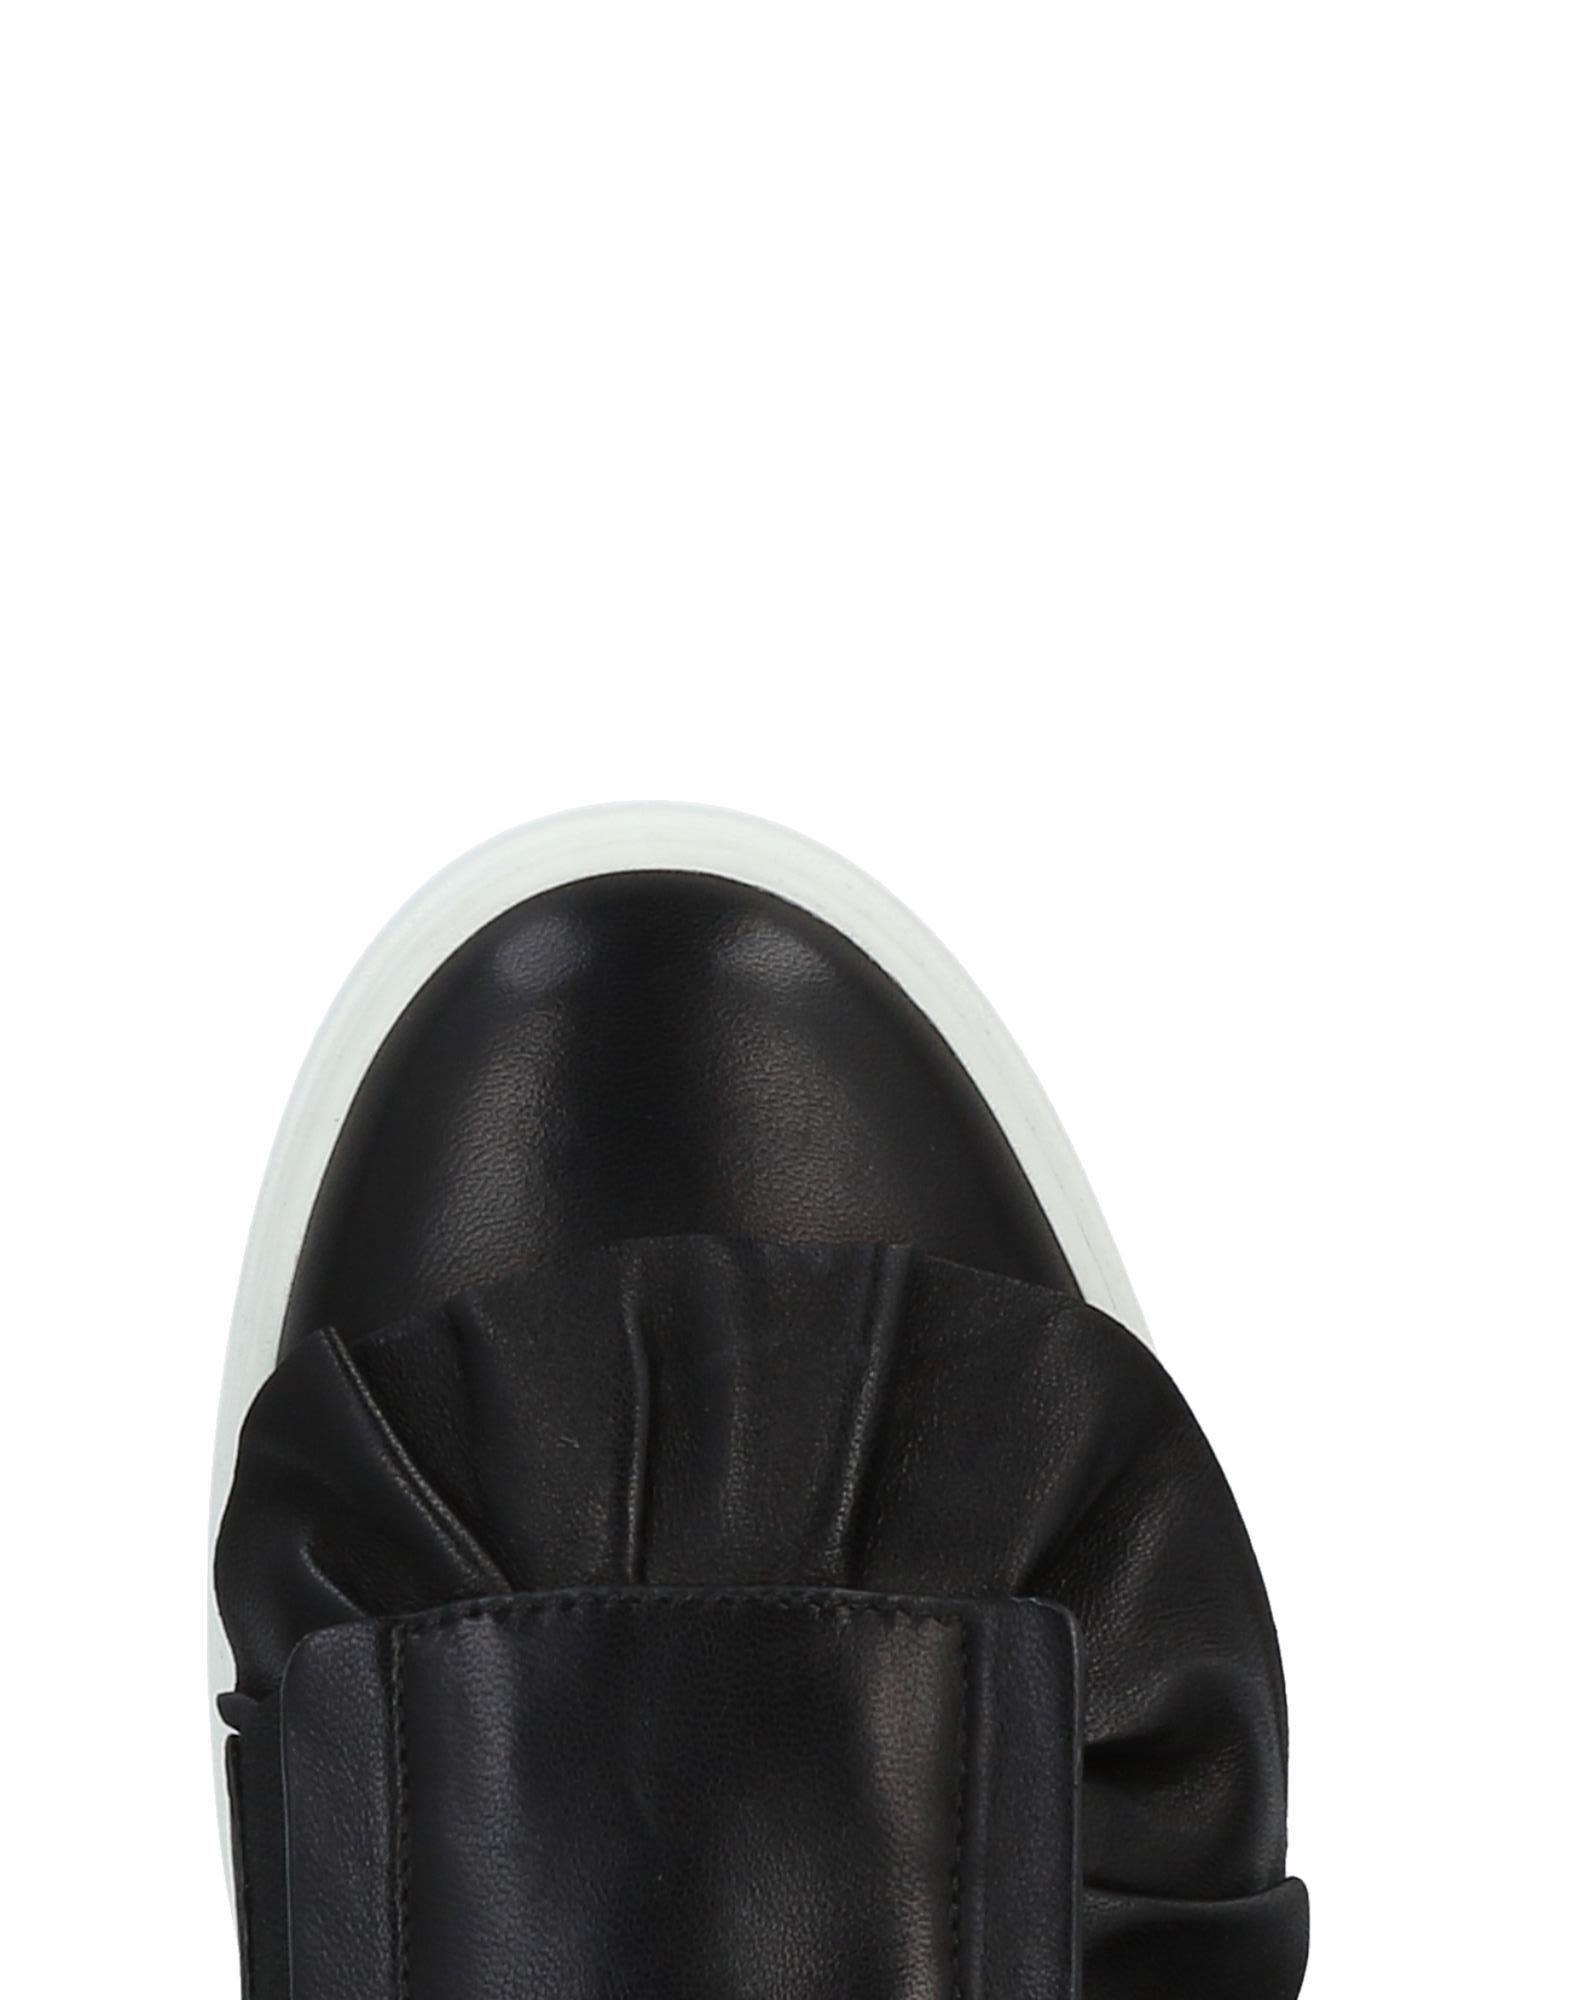 Sneakers Roger Vivier Femme - Sneakers Roger Vivier sur